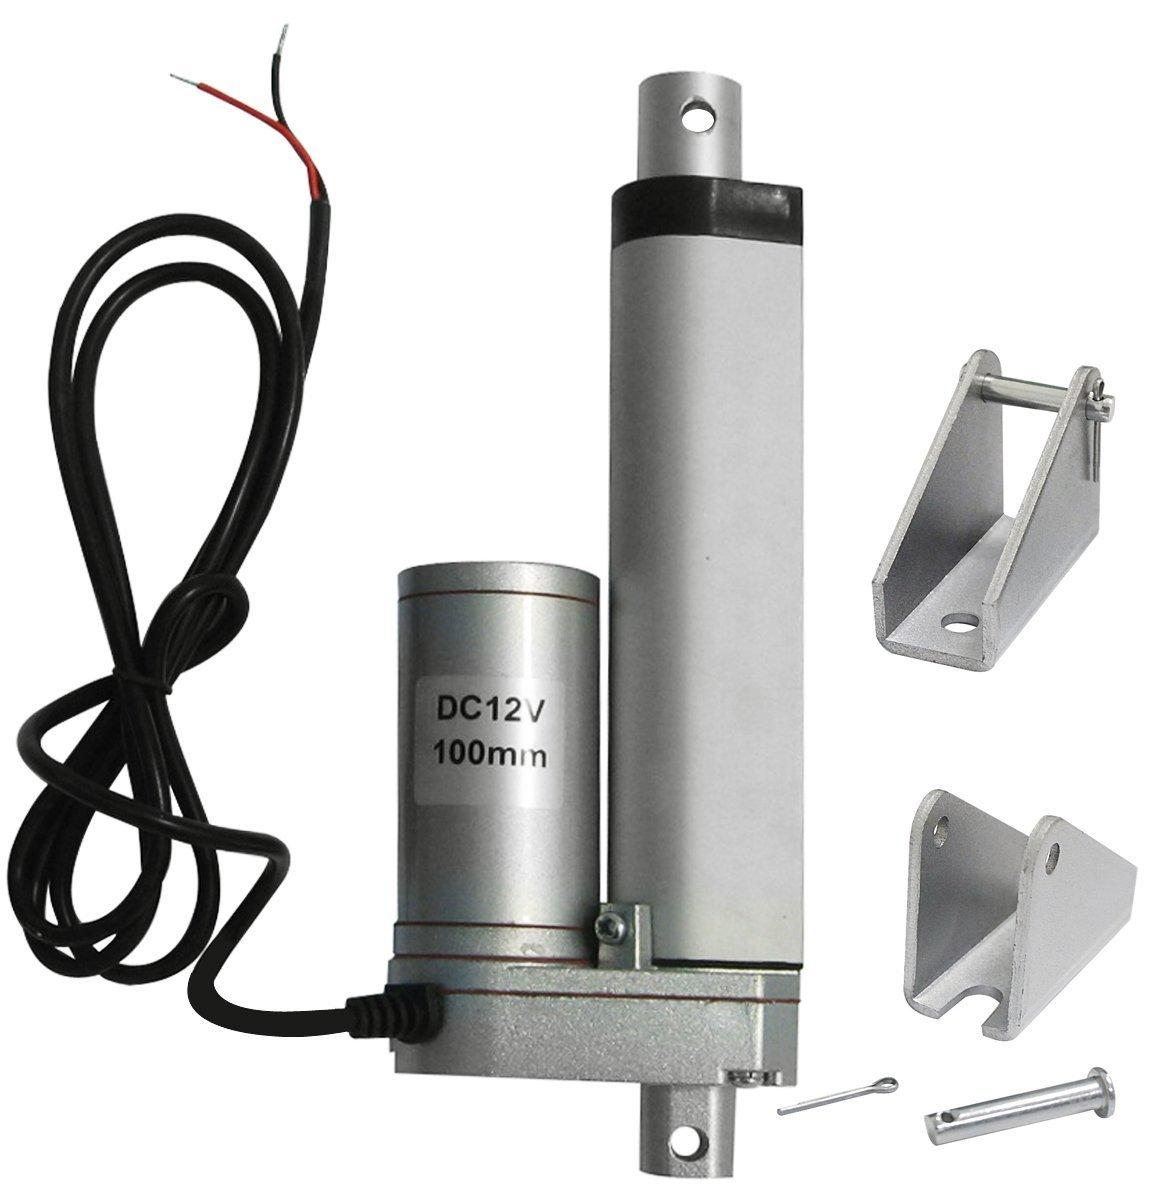 ECO-WORTHY-12V-Linear-Motor-Actuator-Linearer-Motorantrieb-Heavy-Duty-330lbs-Solar-Tracker